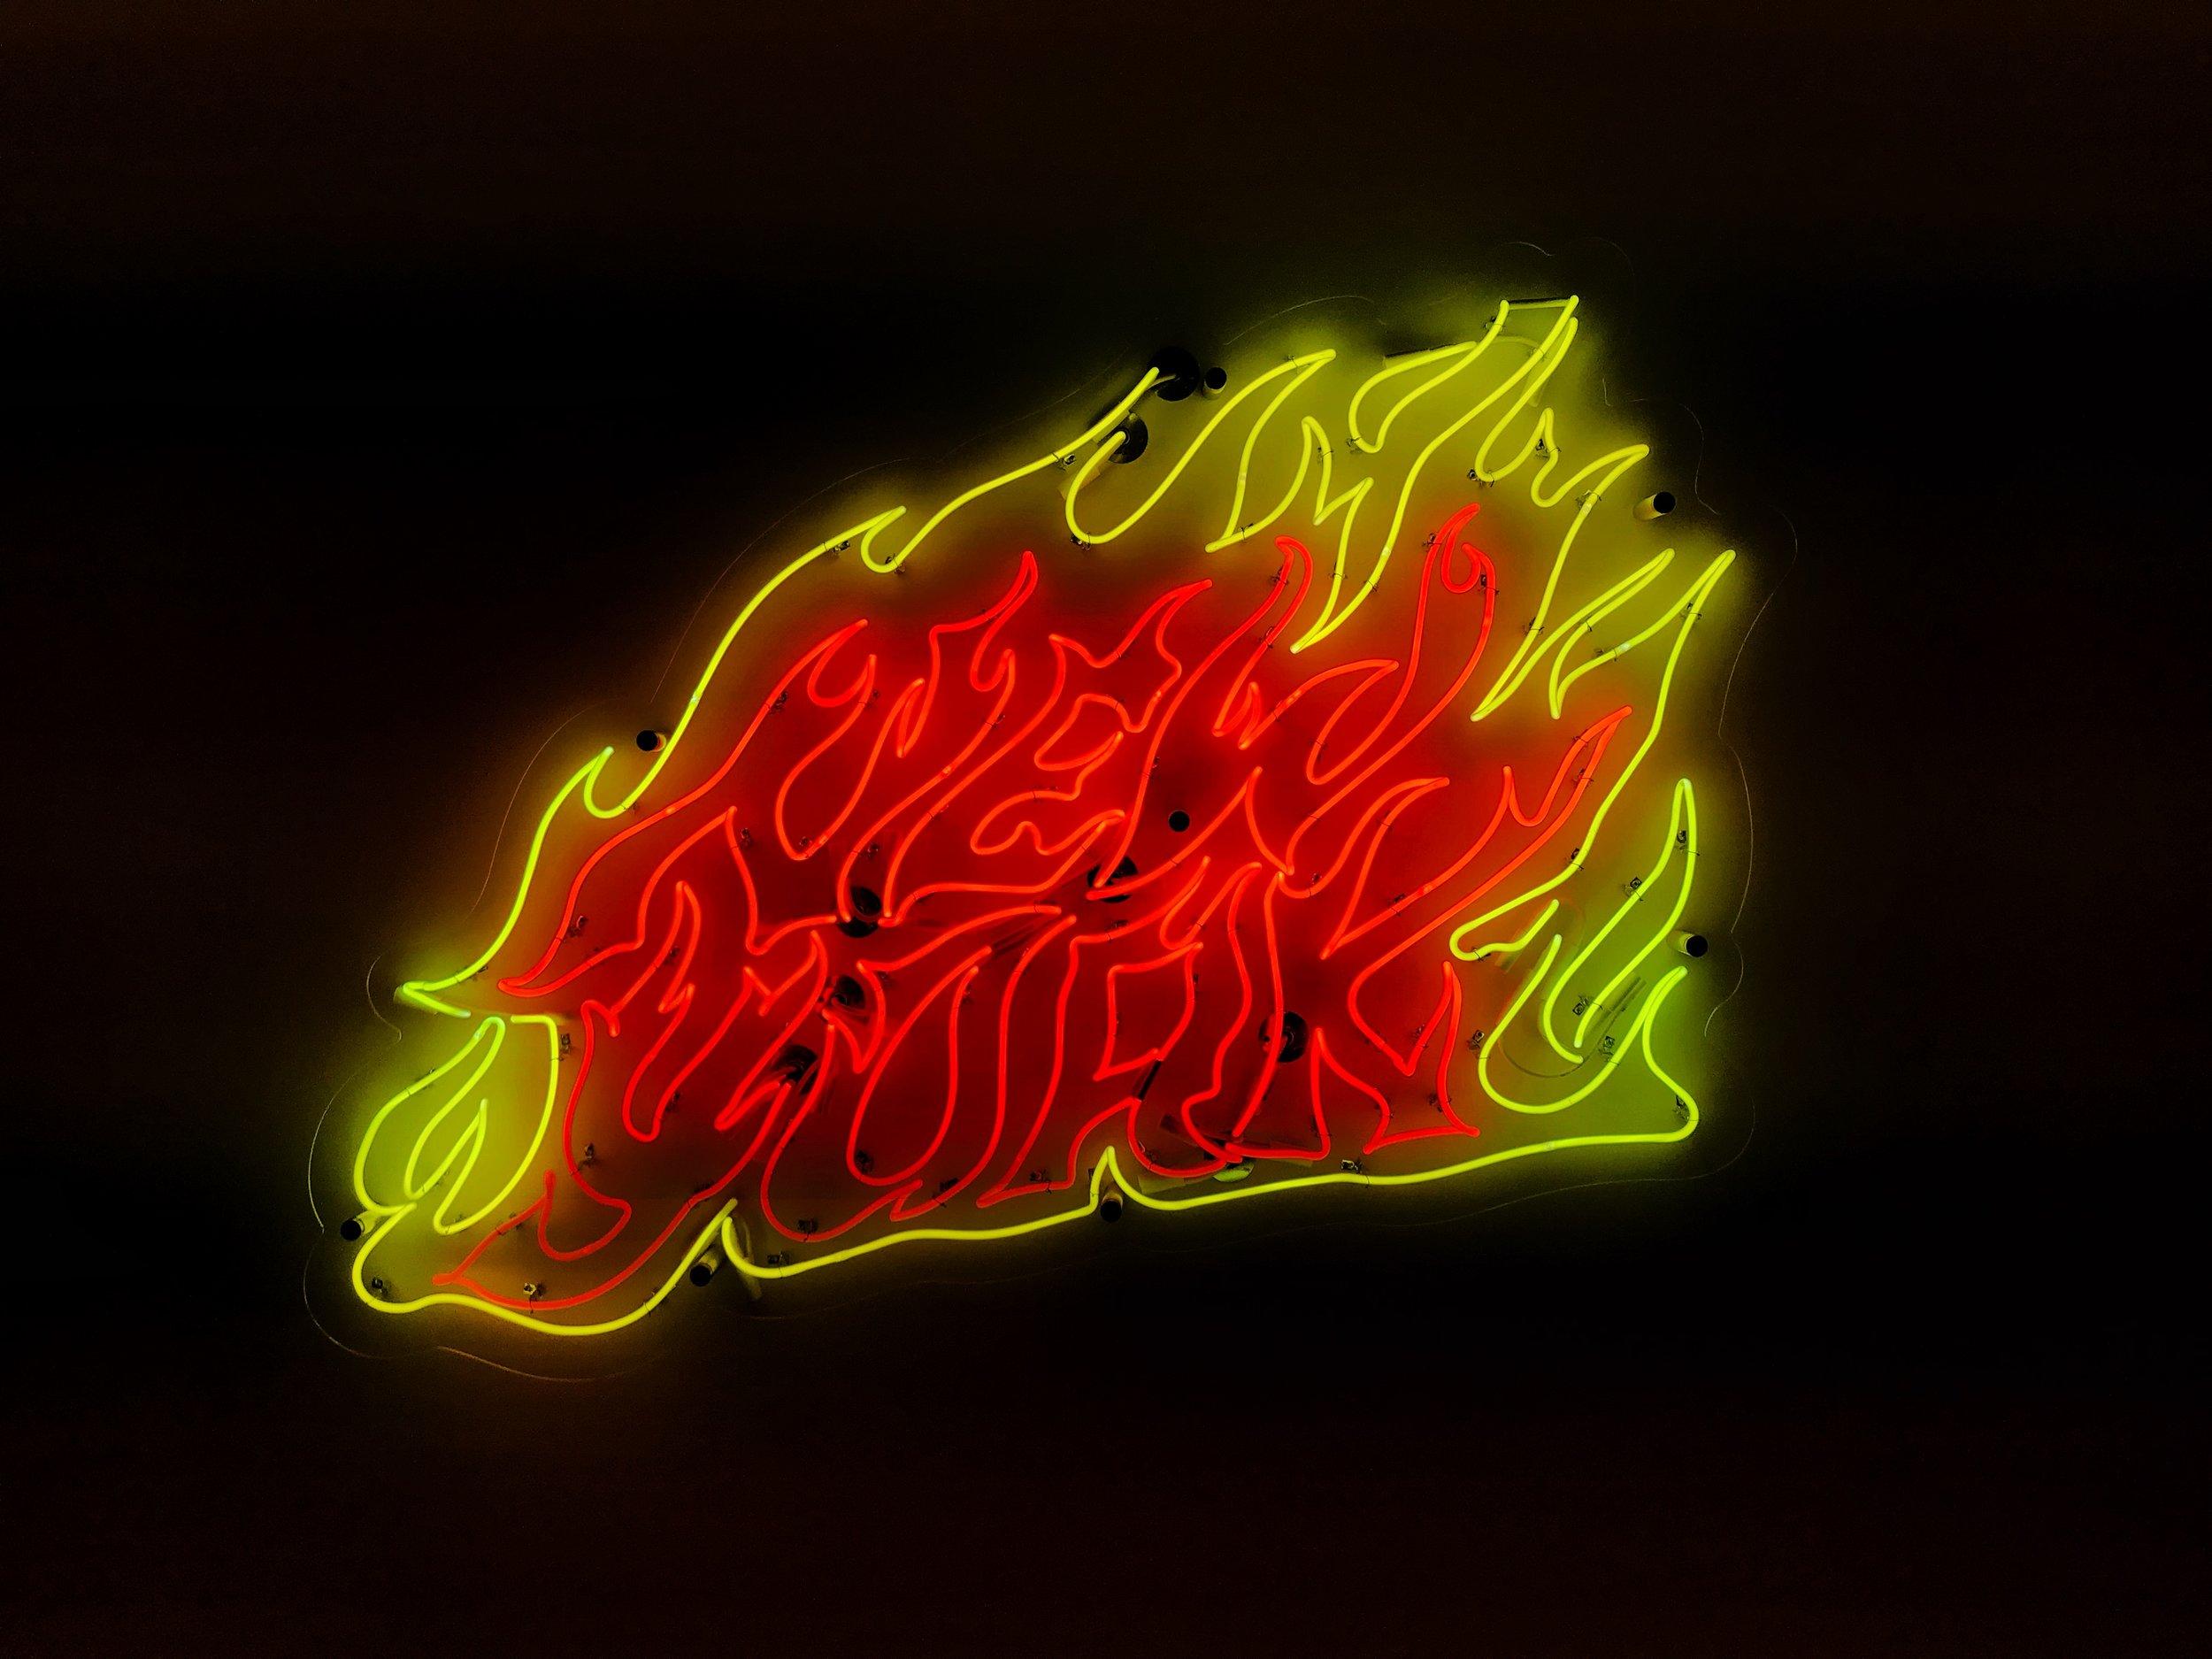 Artwork_85-Broad_New-York-On-Fire_2.JPG